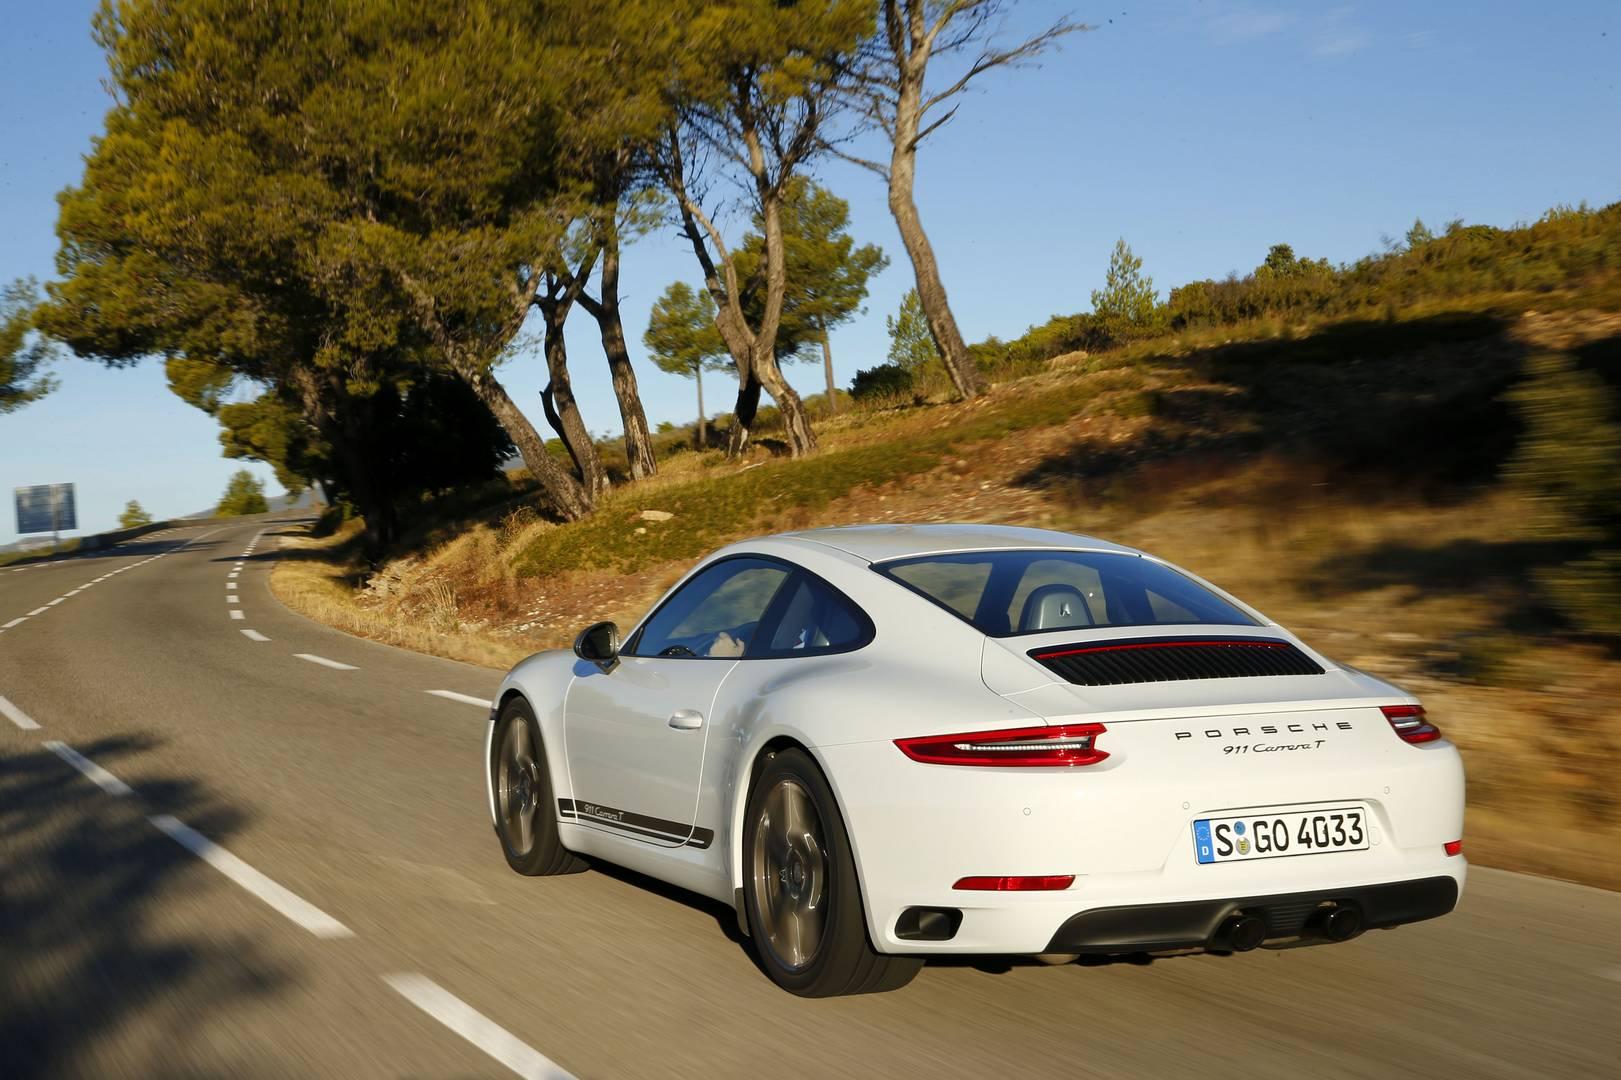 100 Porsche 911 Carrera Porsche 911 Carrera S Cab